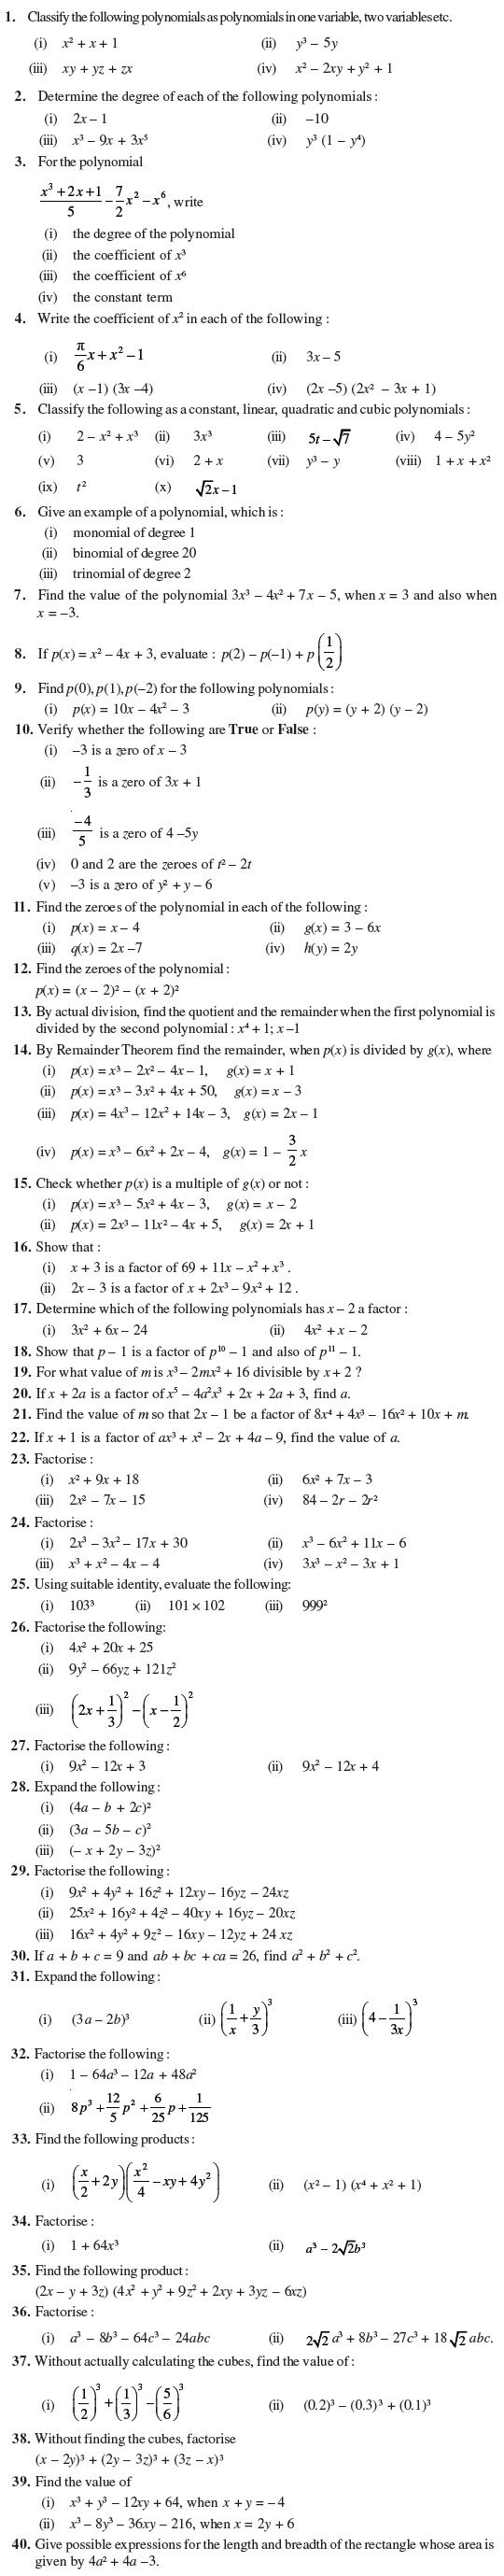 Class 9 Important Questions For Maths Polynomials Polynomials Math Worksheets [ 2758 x 540 Pixel ]